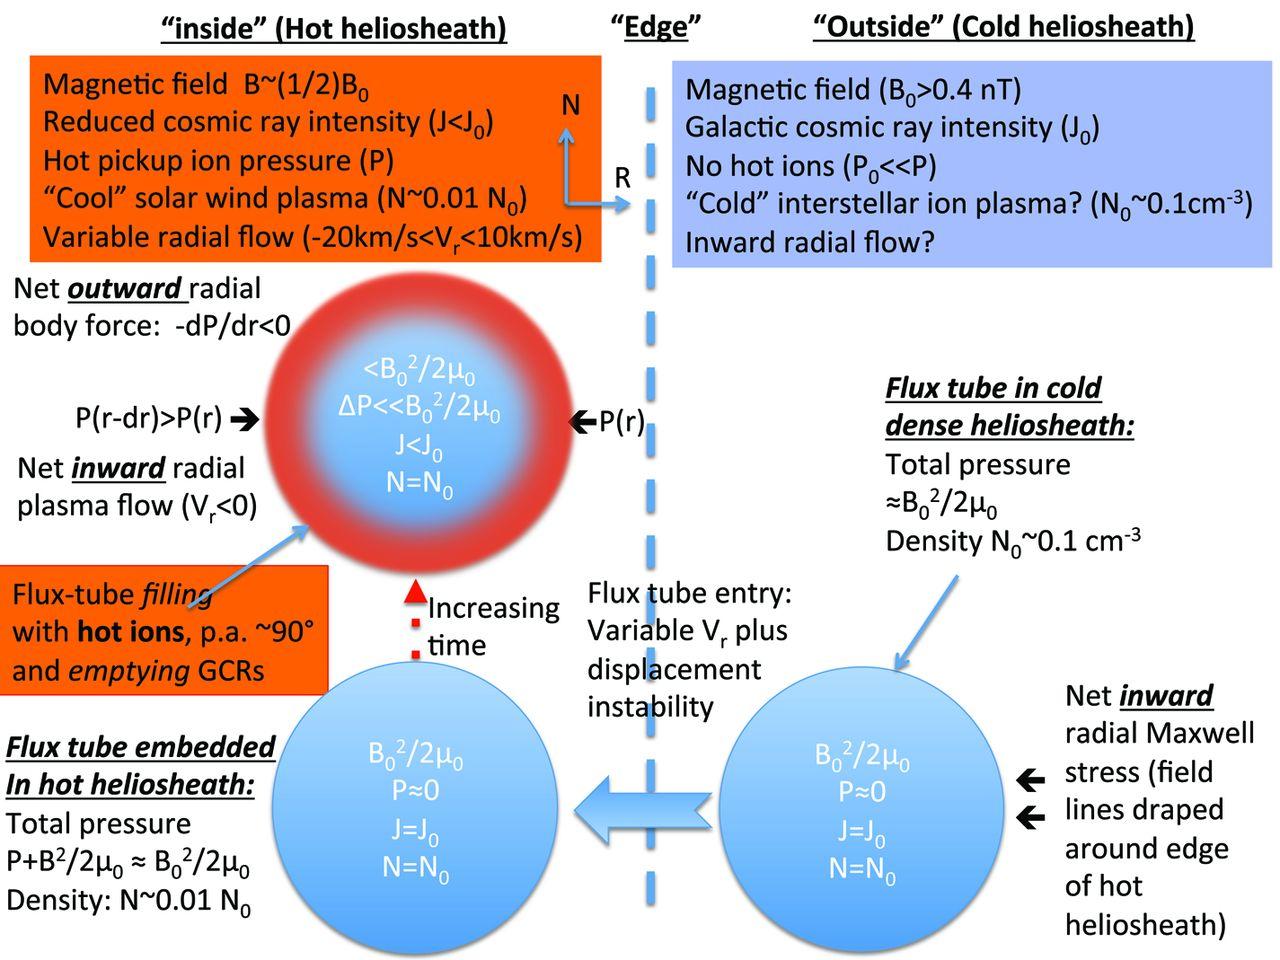 Dibujo20130701 Voyager-1 - inside hot heliosheath - outside cold heliosheath